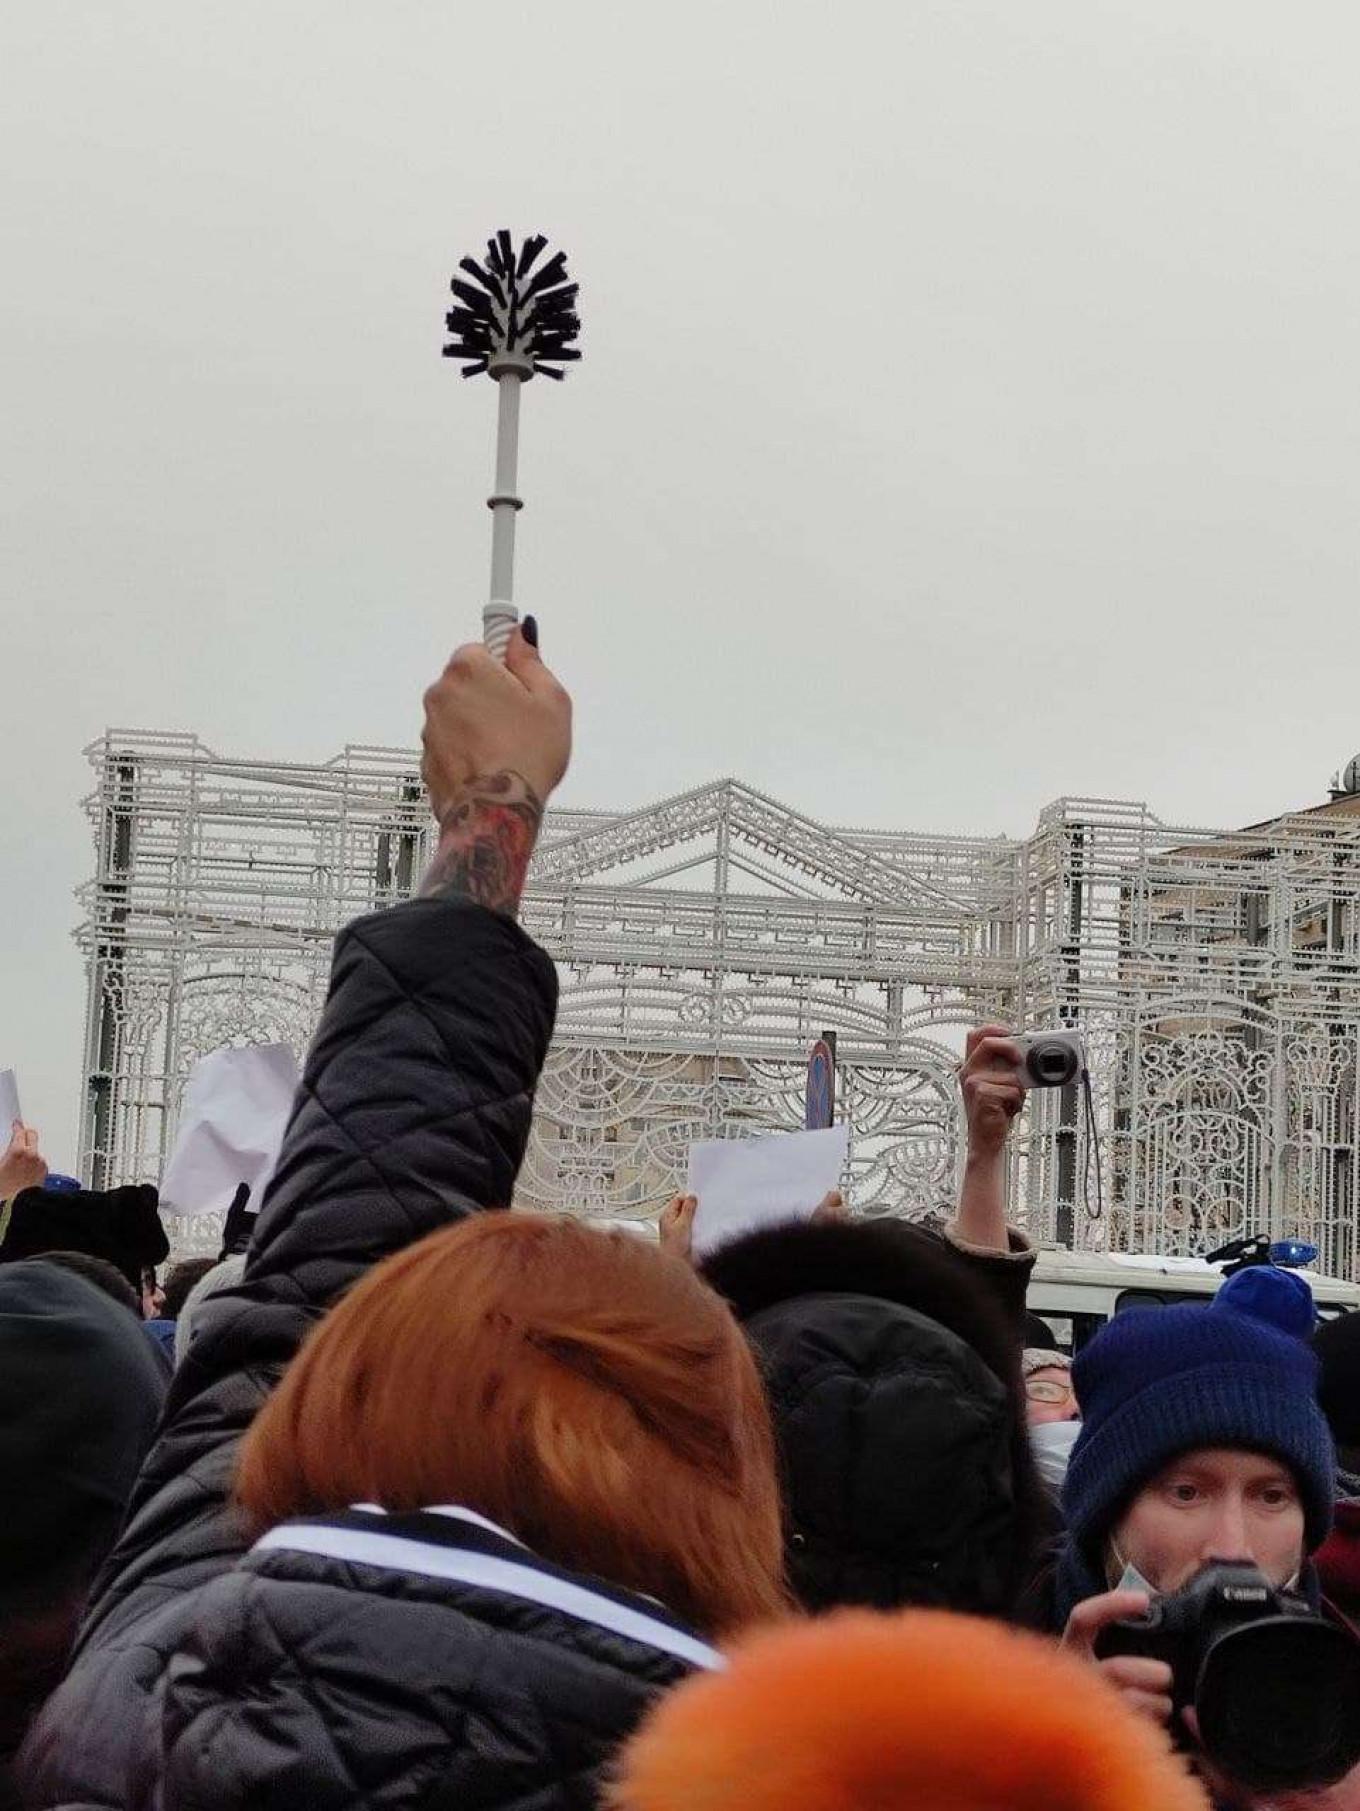 Yekaterina Grobman / VTimes